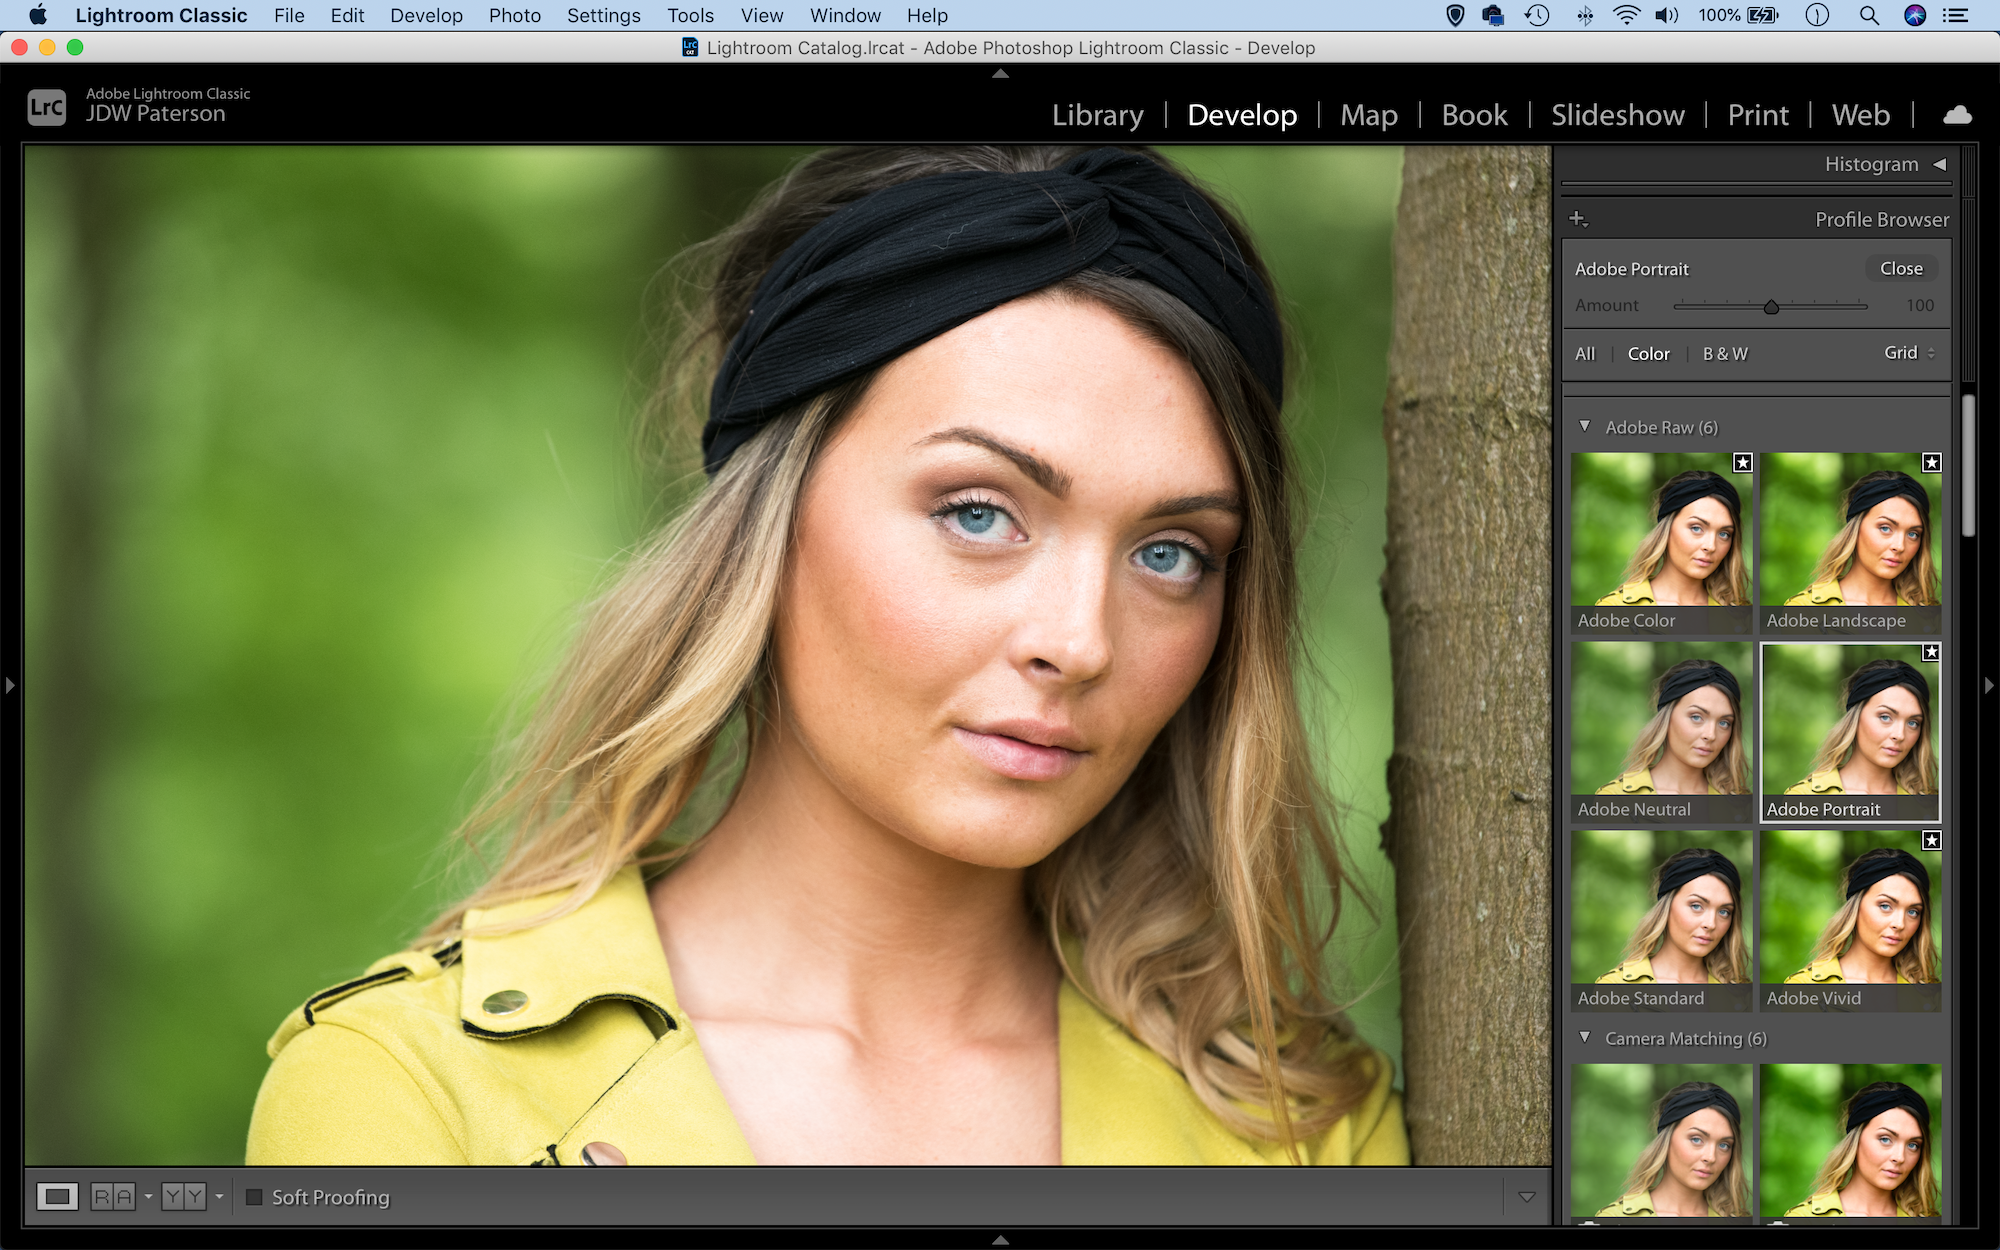 Screenshot of the profile browser in Lightroom